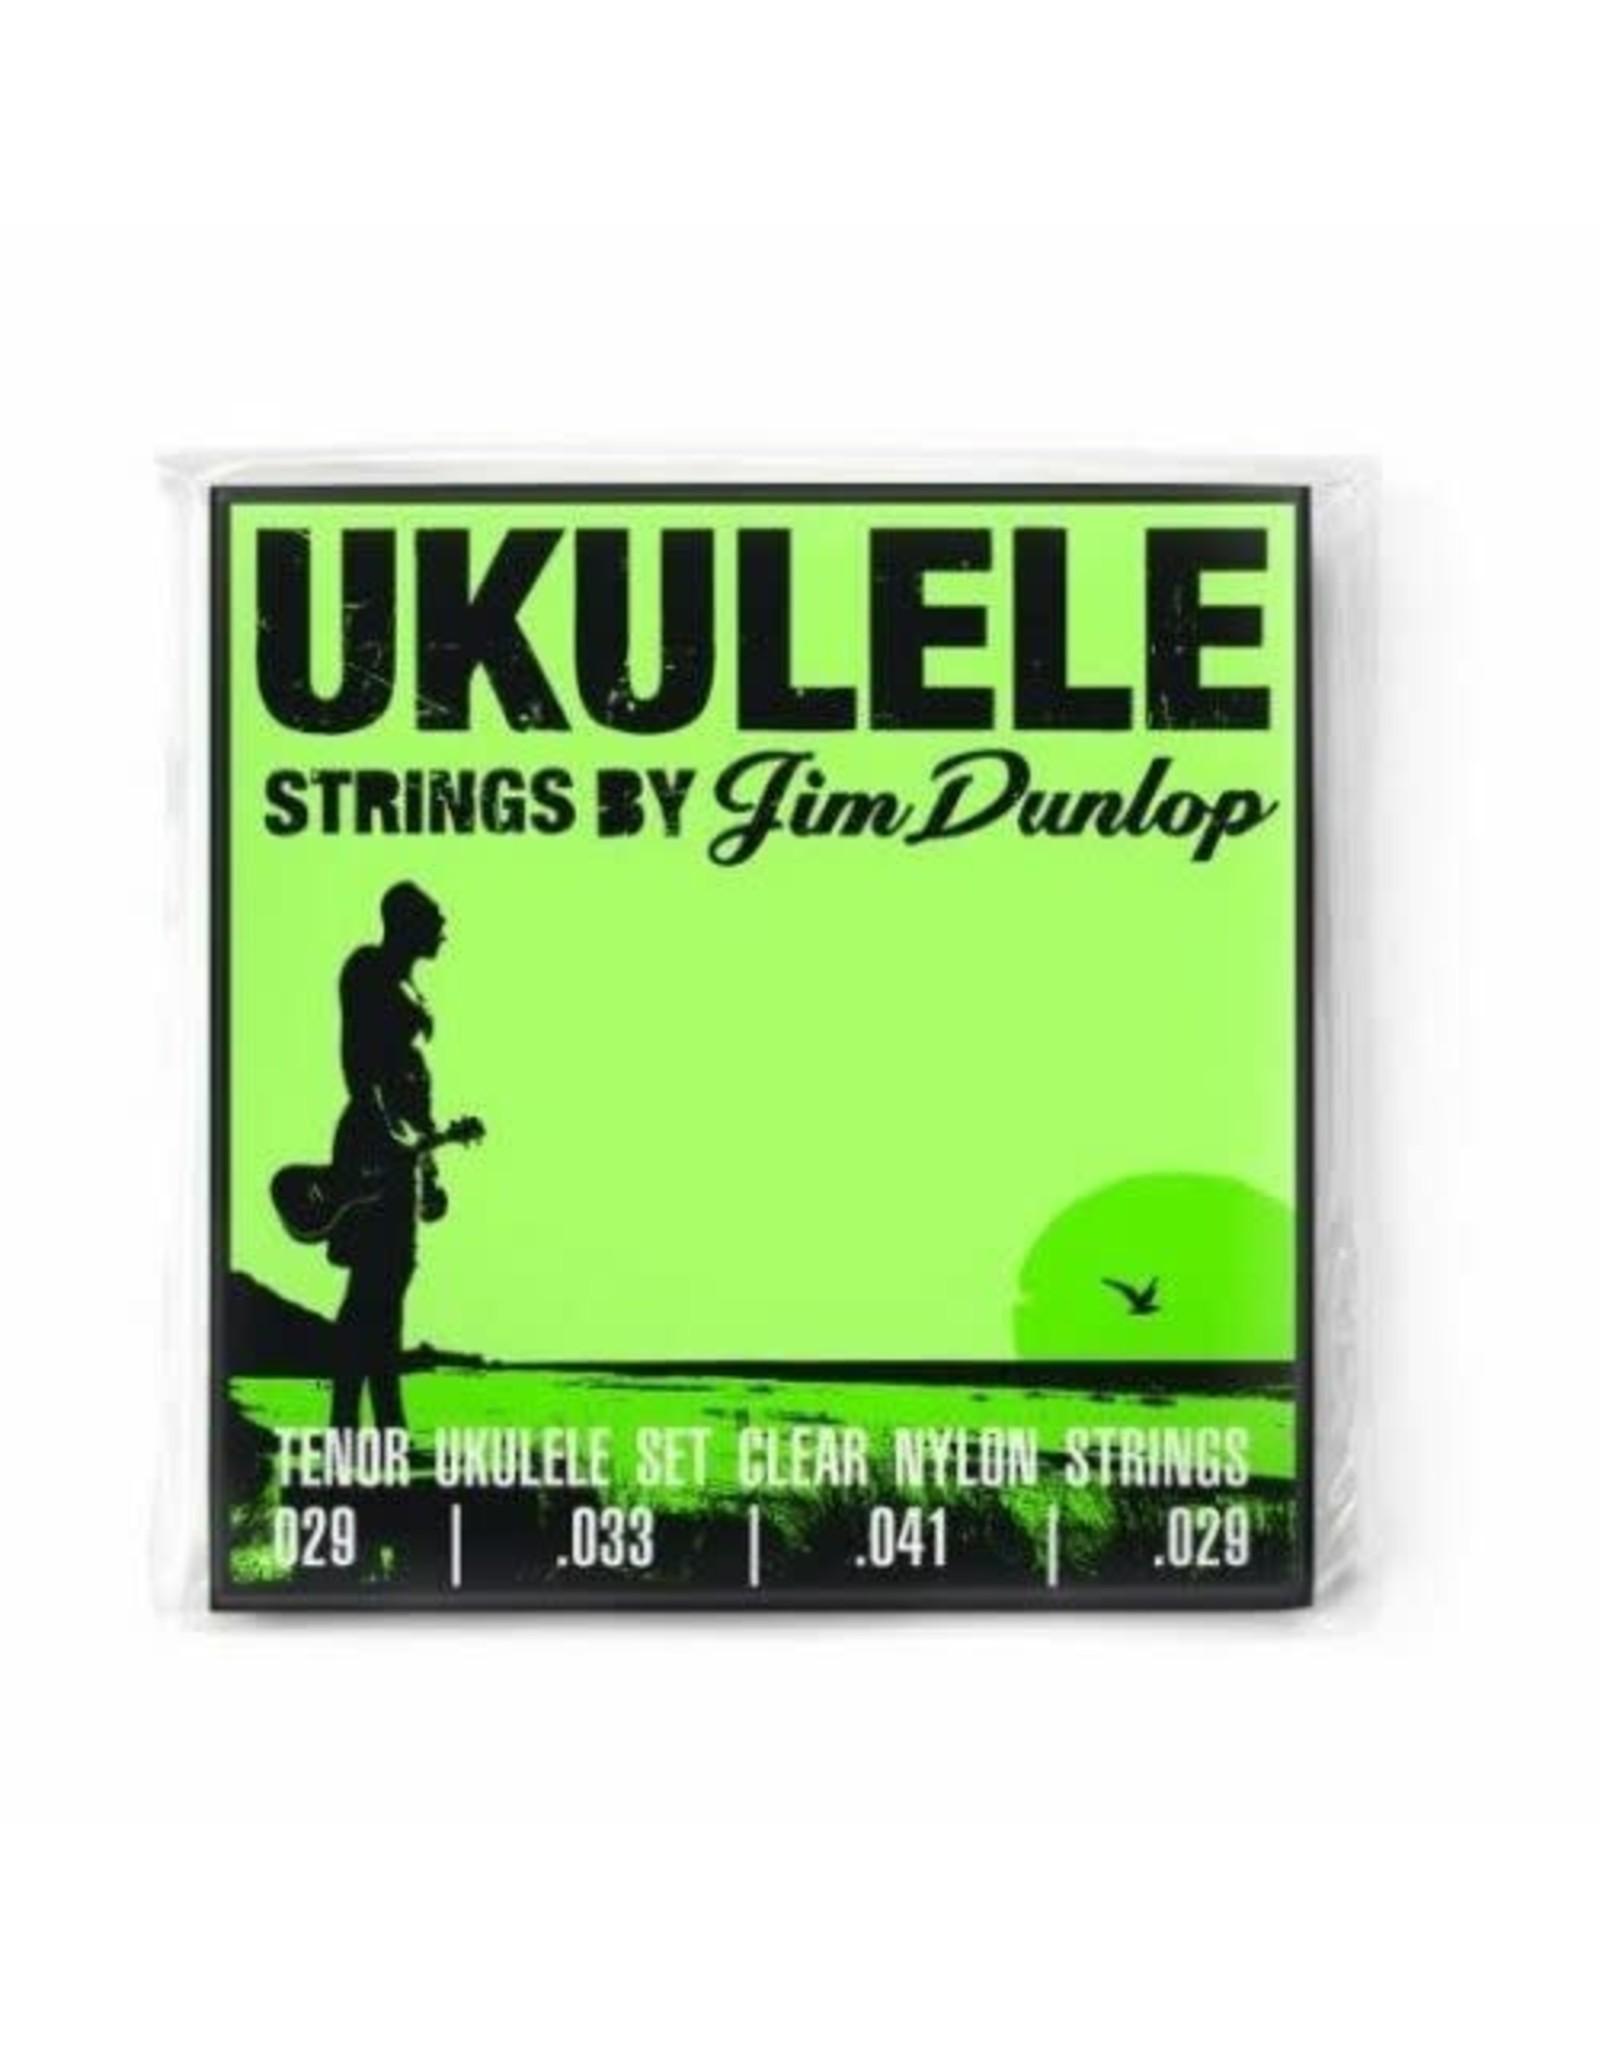 Jim Dunlop Ukulele Strings by Jim Dunlop DUY303